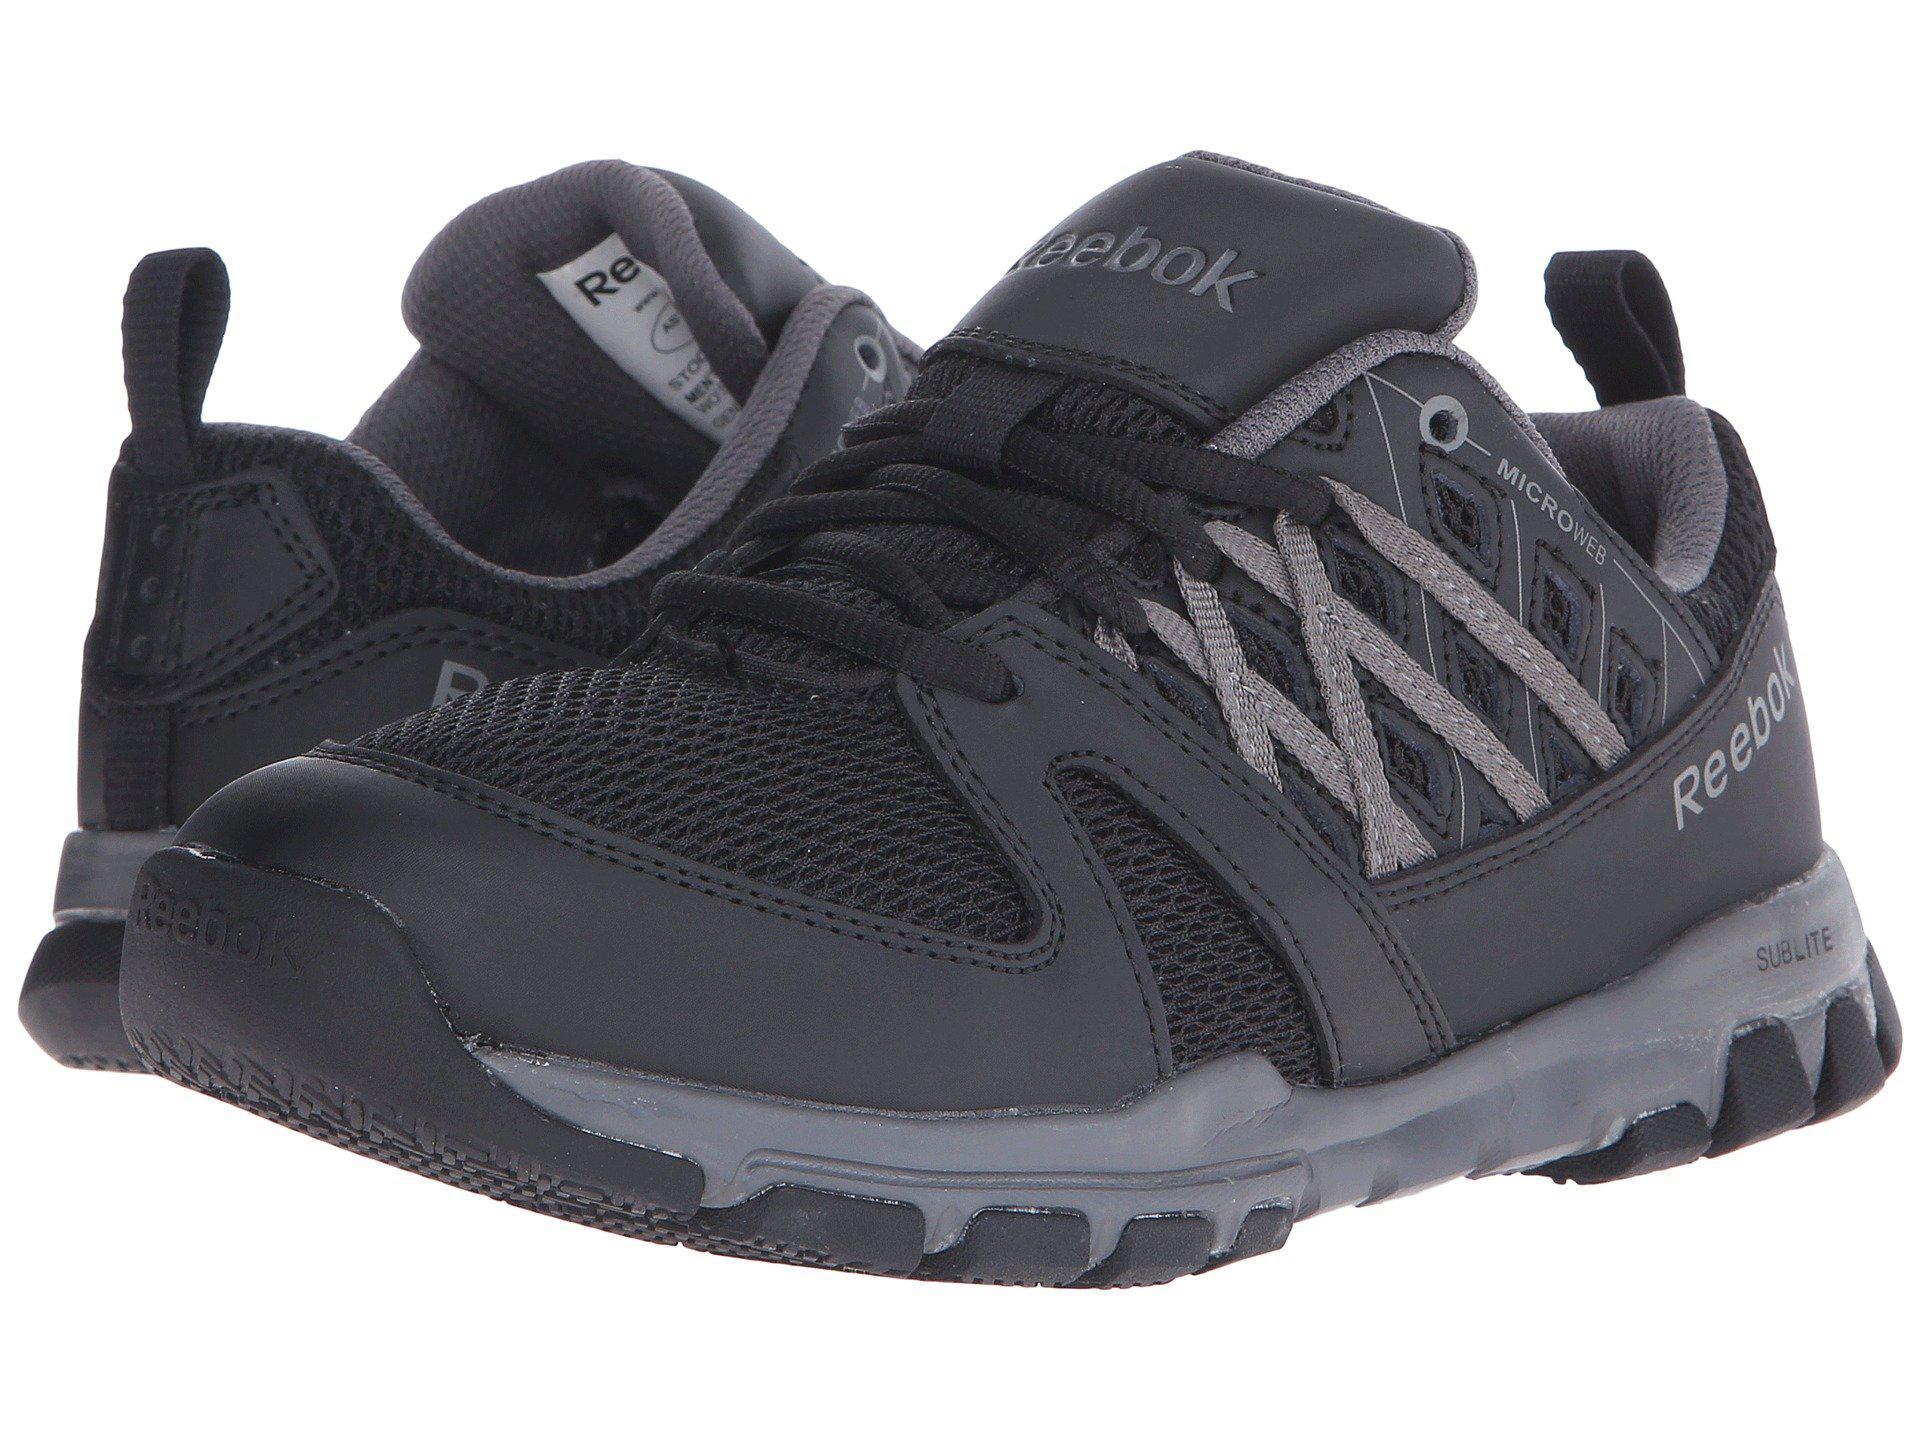 Lyst - Reebok Sublite Work Soft Toe (black) Women s Work Boots in Black 4b66ced84